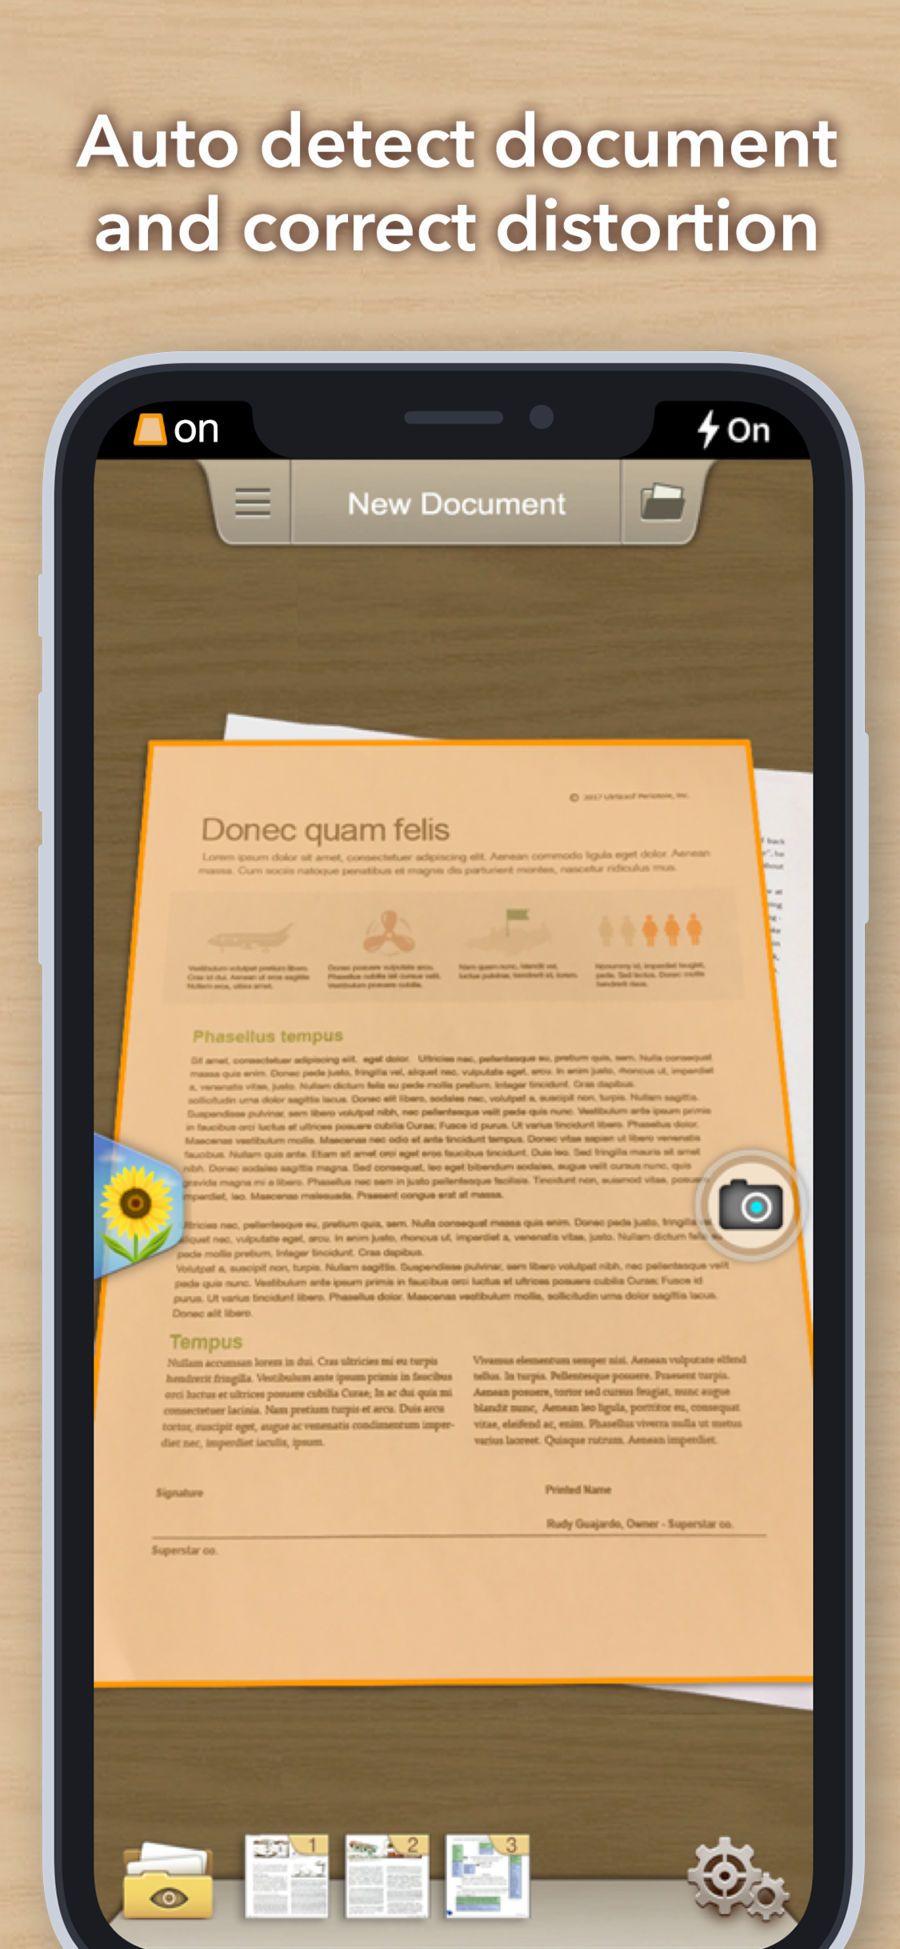 Doc Scan Fax PDF Scanner BusinessIFUNPLAYios